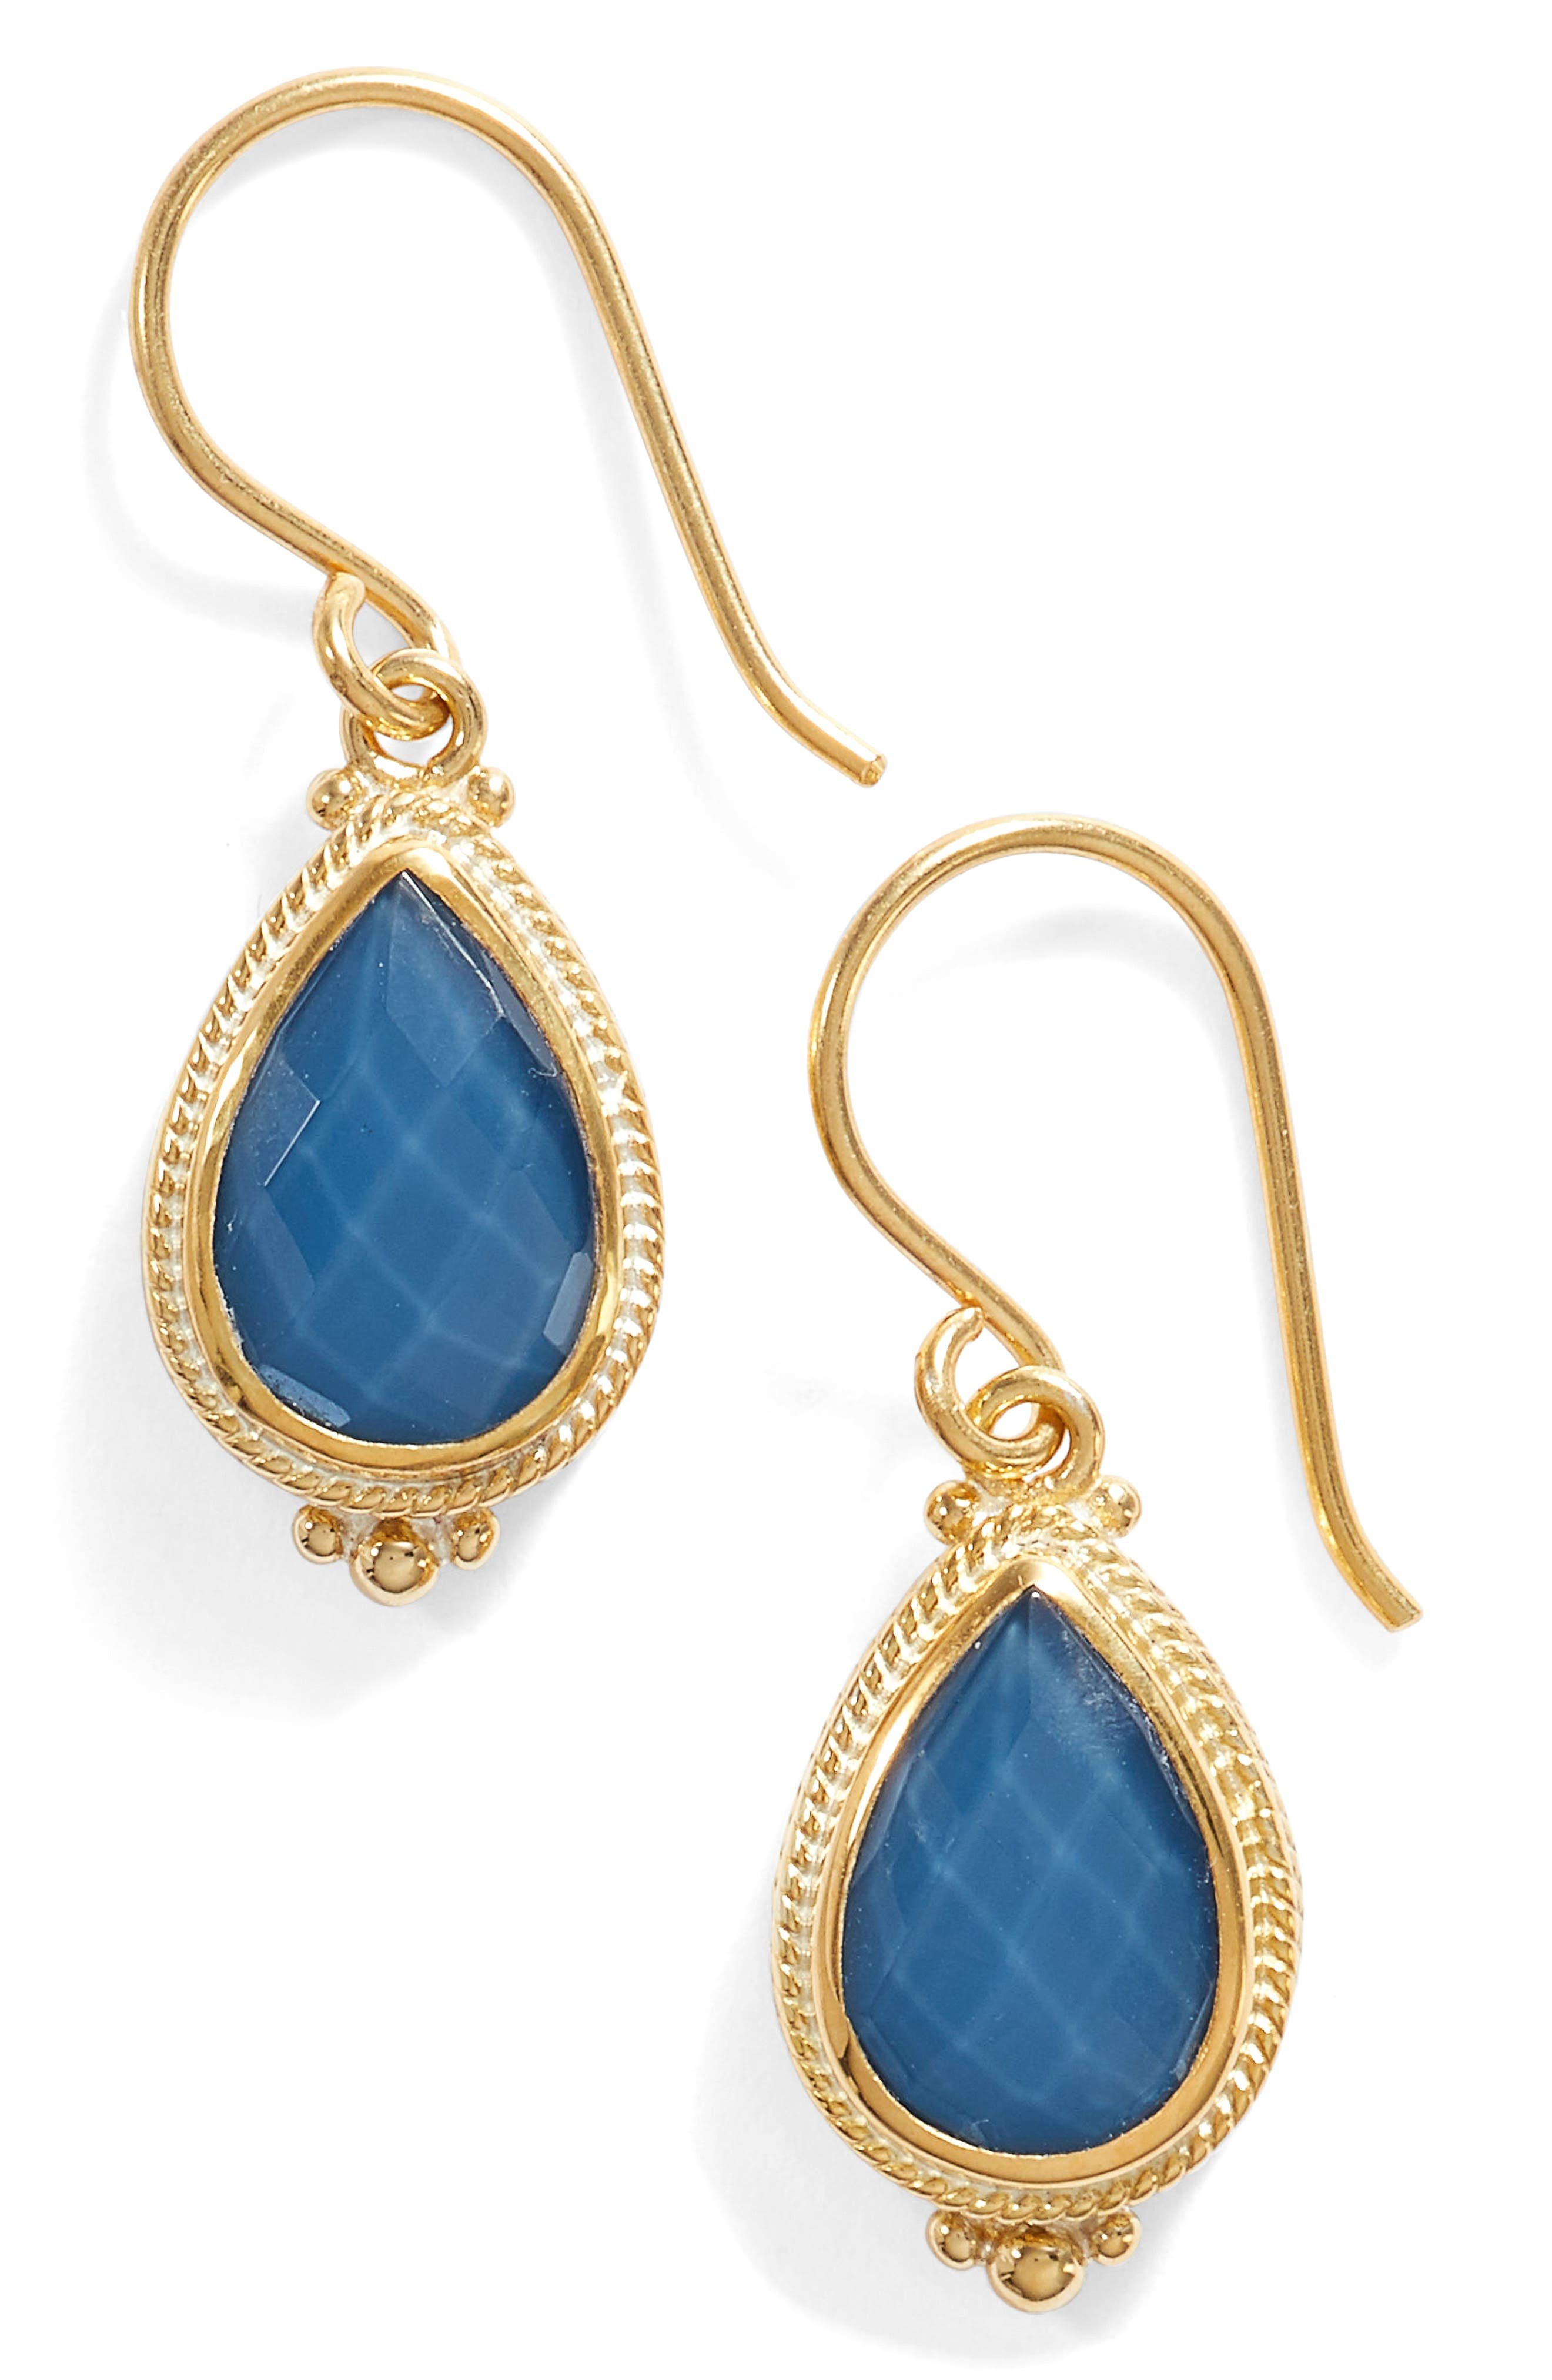 Blue Quartz Small Teardrop Earrings,                         Main,                         color, Gold/ Blue Quartz